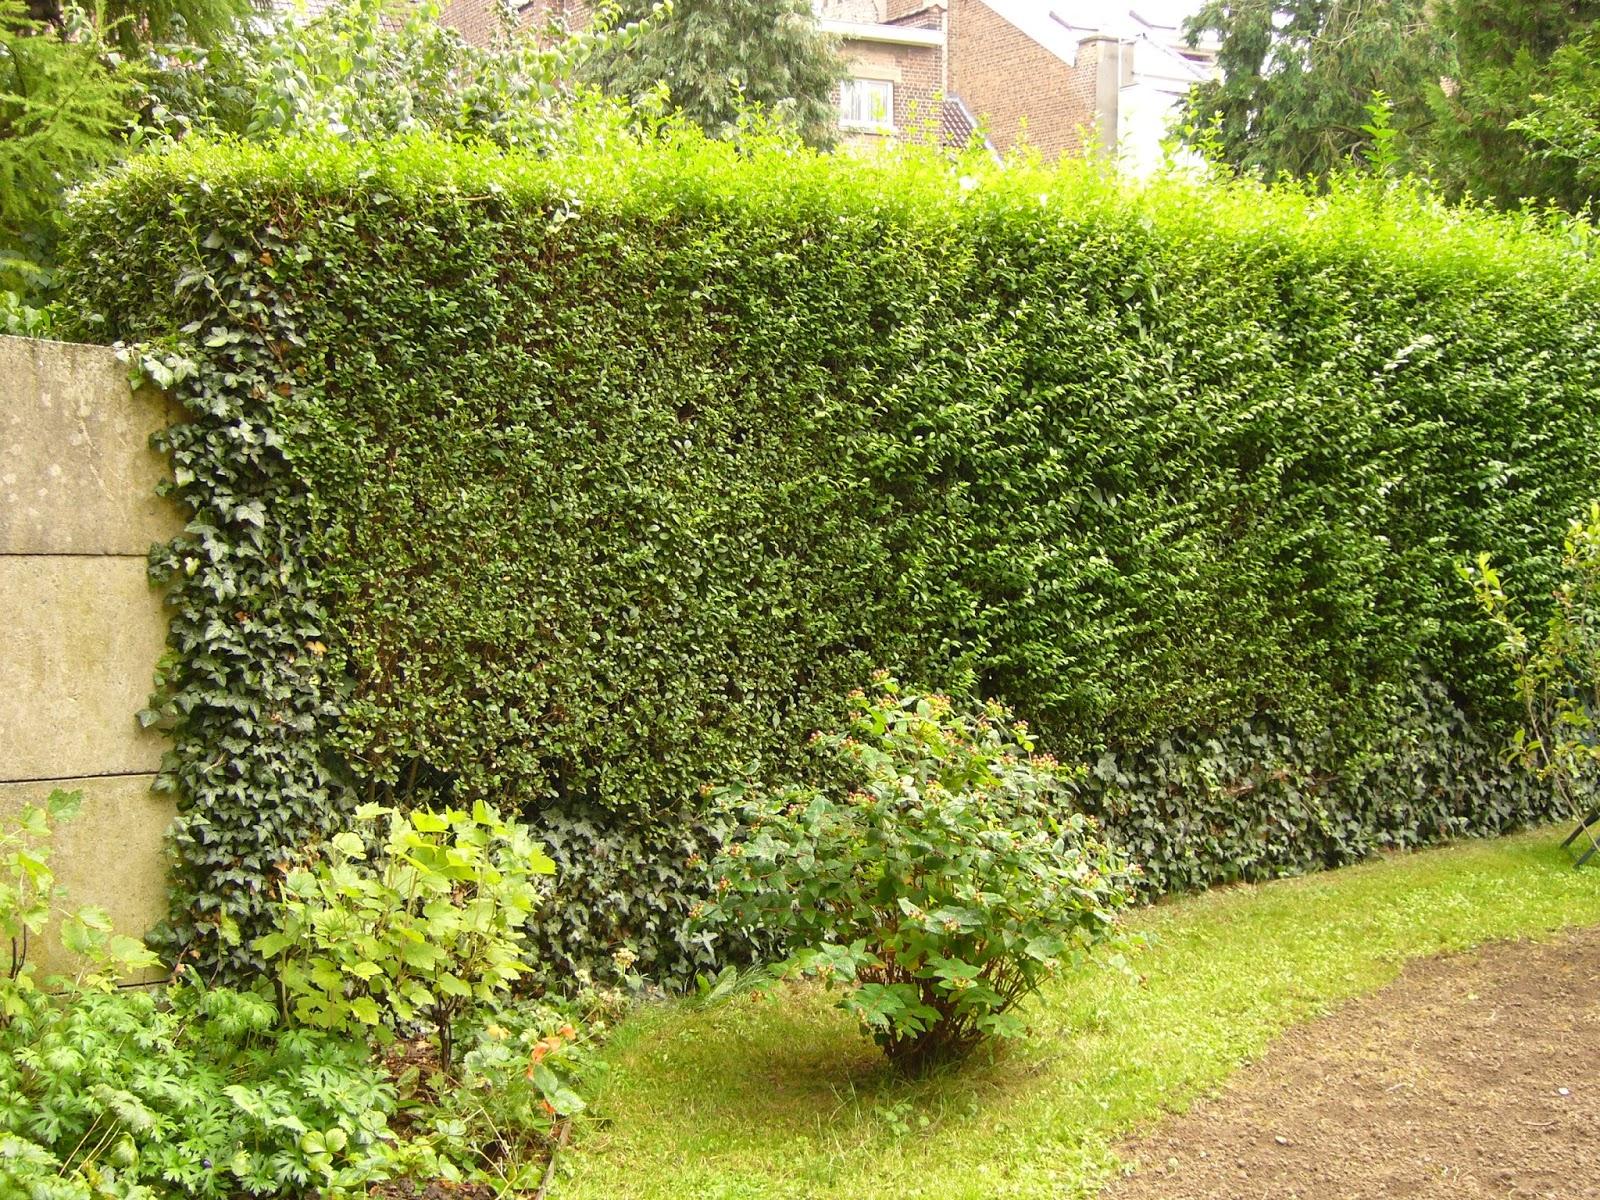 Jardin potager comestible partager for Jardin 4 moineaux